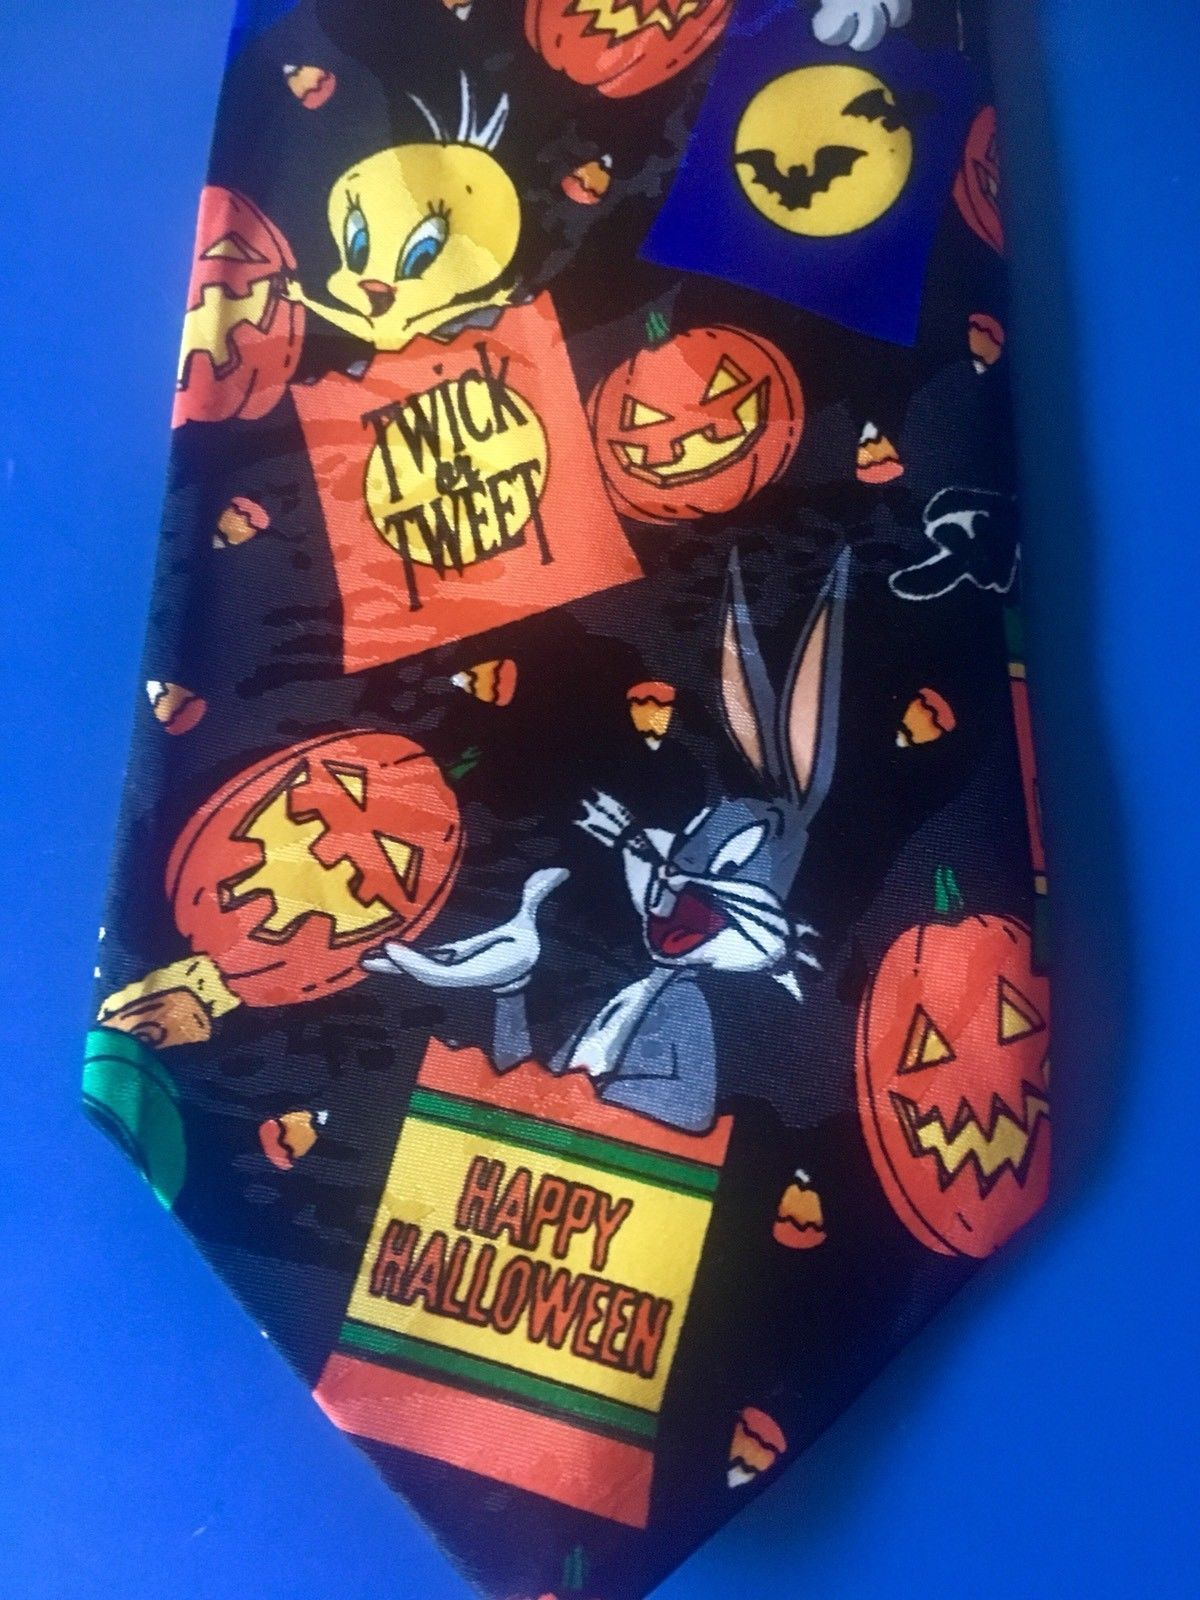 Halloween Tweety Bca Flazz Edition Bugs Daffy Awesome Looney Tunes Novelty Tie Taz Marvin Twick 1200x1600